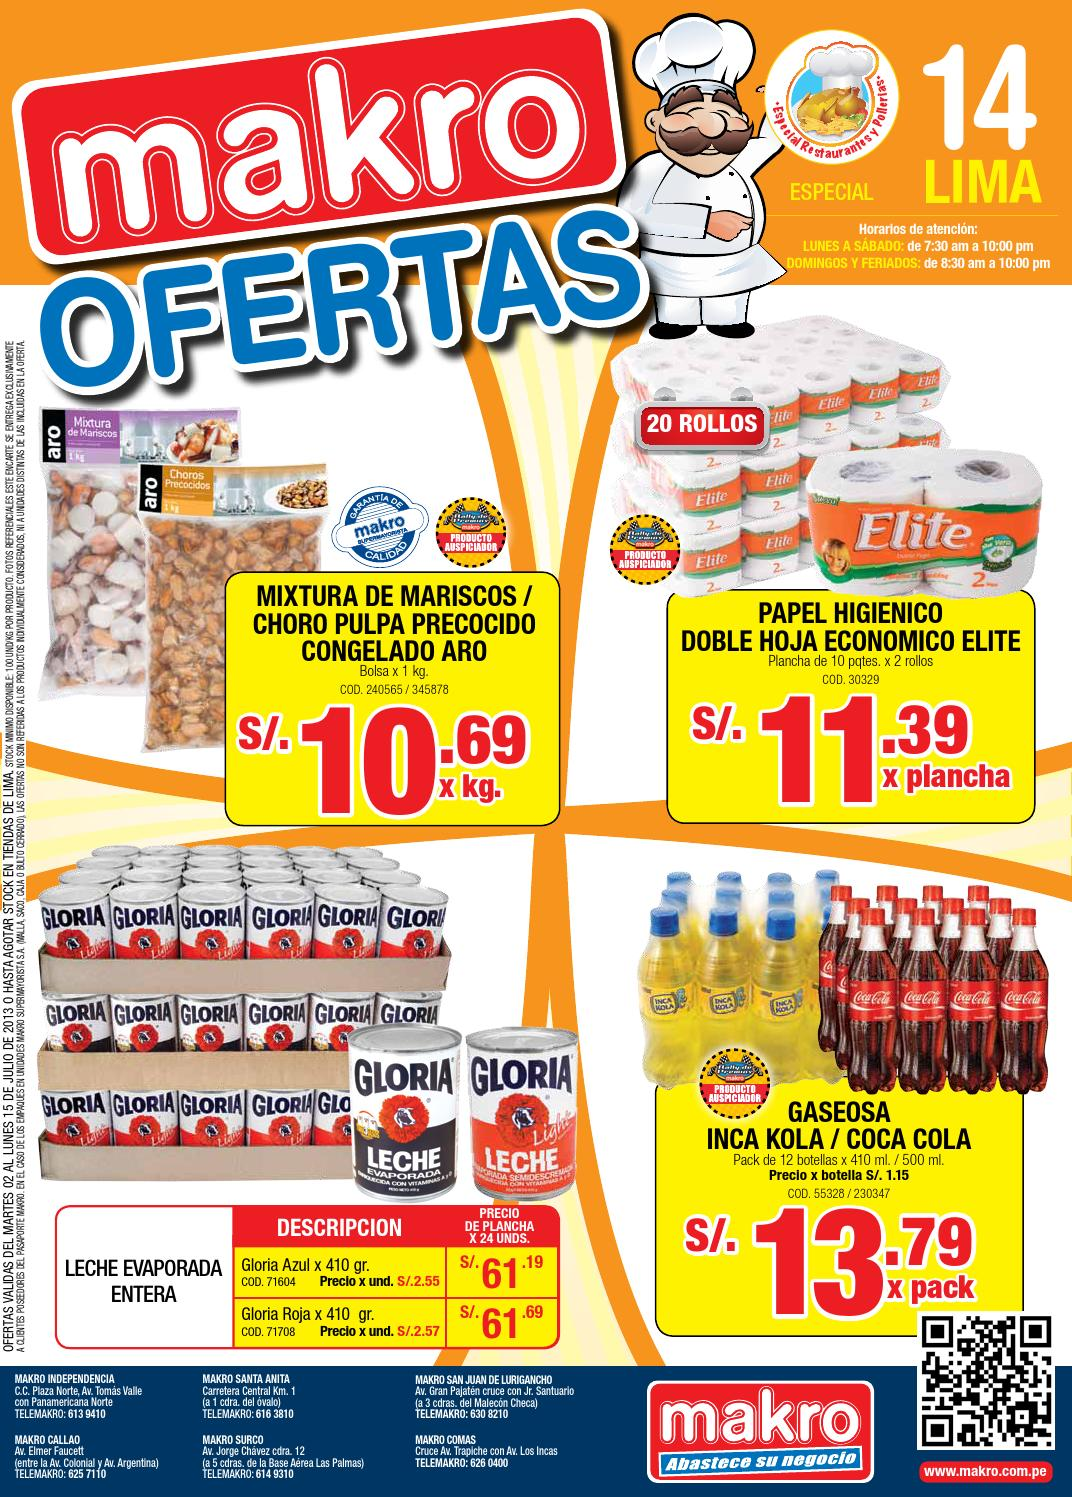 Makro ofertas by makro peru makro issuu for Makro asturias catalogo